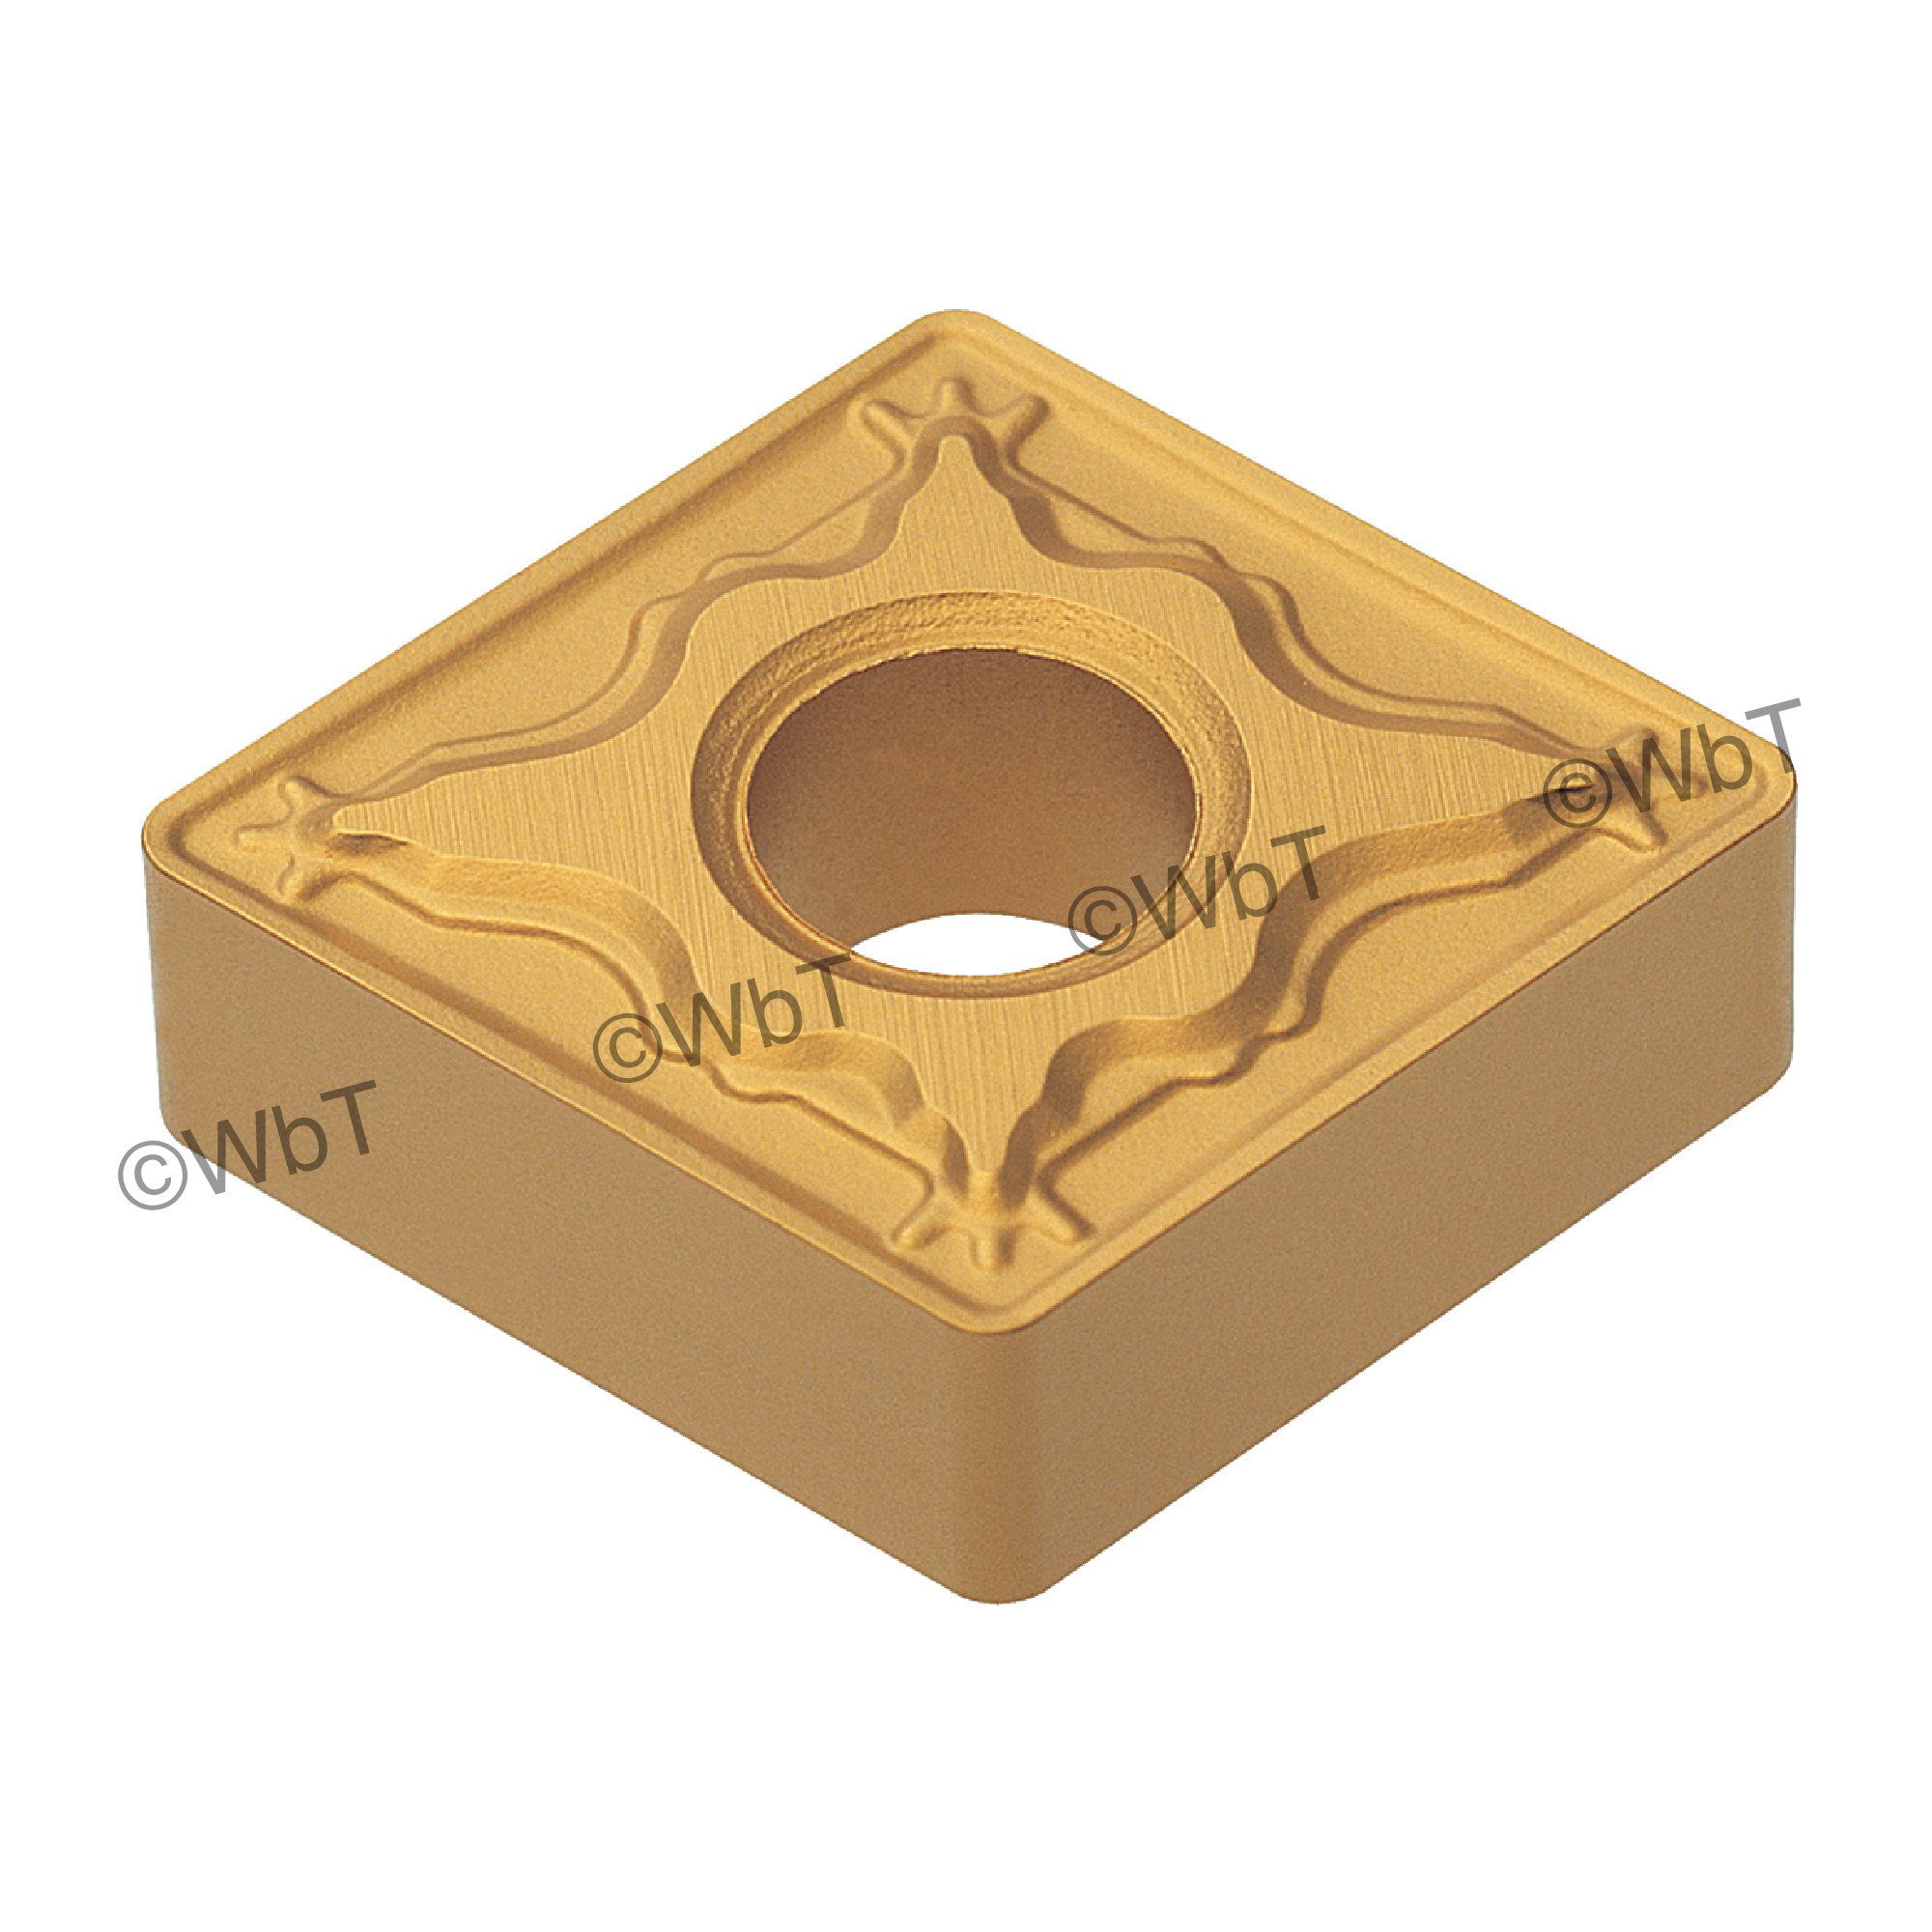 AKUMA - CNMG431-MRP1 CT25M - 80° Diamond / Indexable Carbide Turning Insert